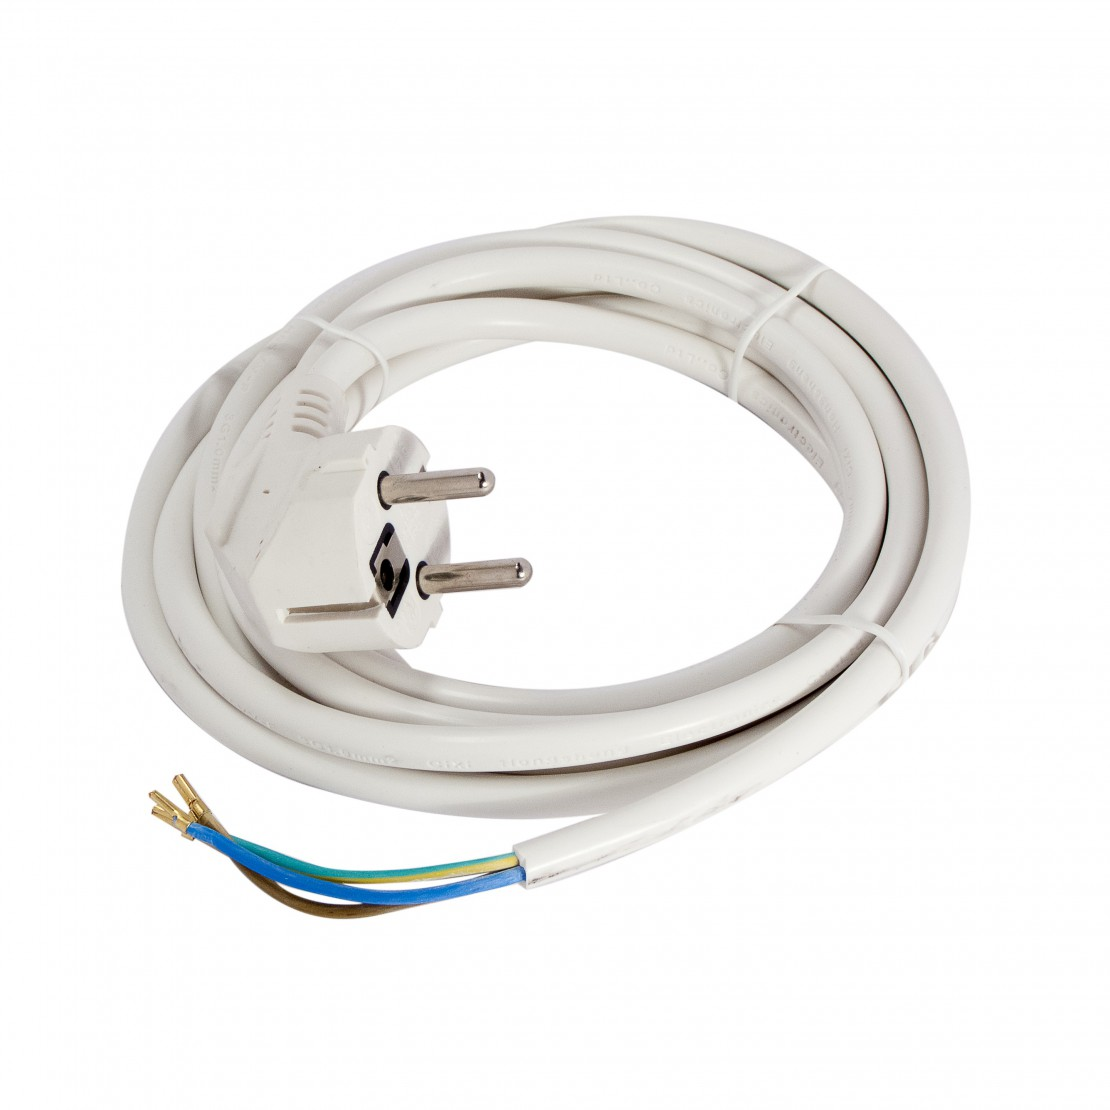 Cable HO5VVF - 1,5m - 3x1,5mm2- Marrón(SCH)